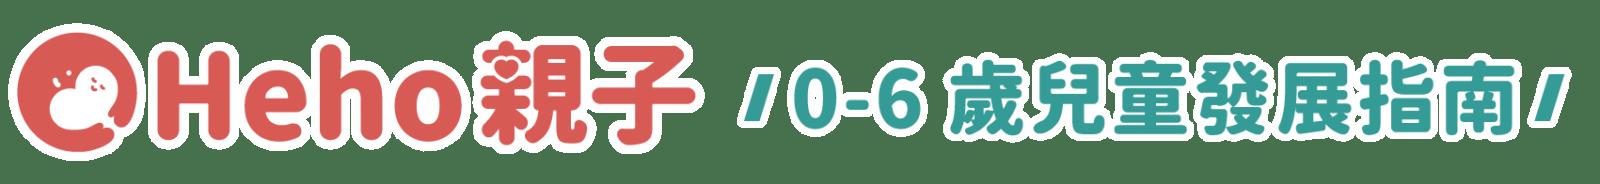 Heho親子0-6歲兒童發展指南